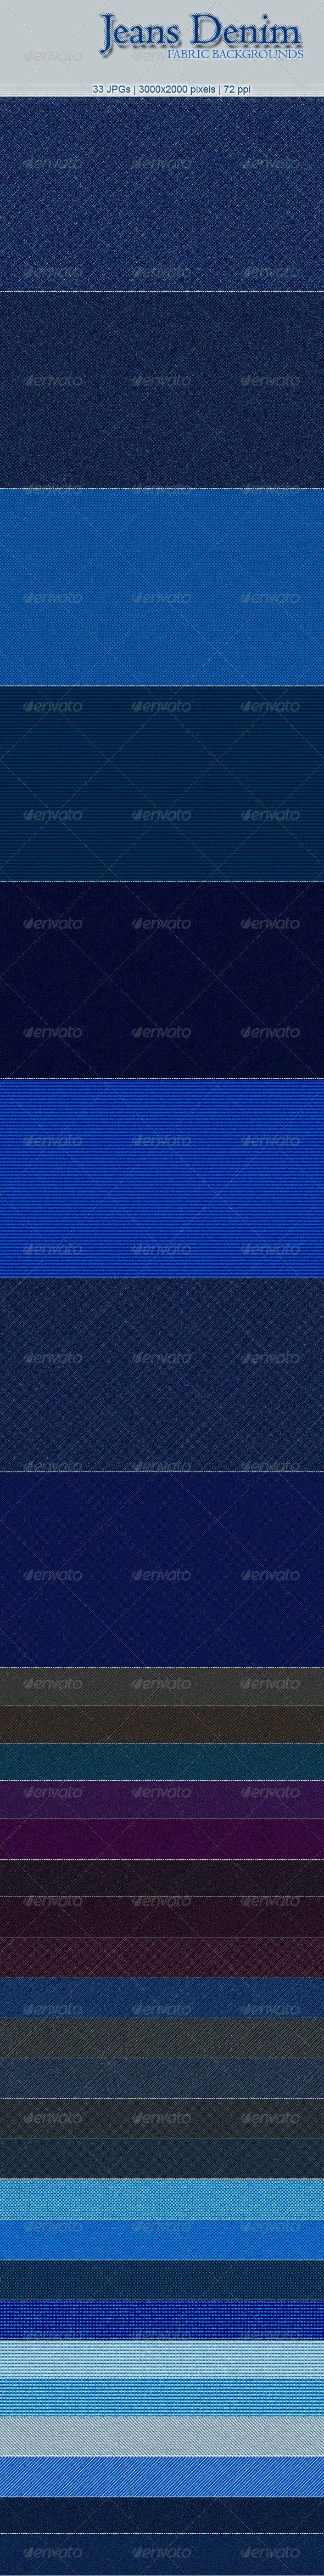 33 Jeans Denim Fabric Backgrounds - Miscellaneous Backgrounds